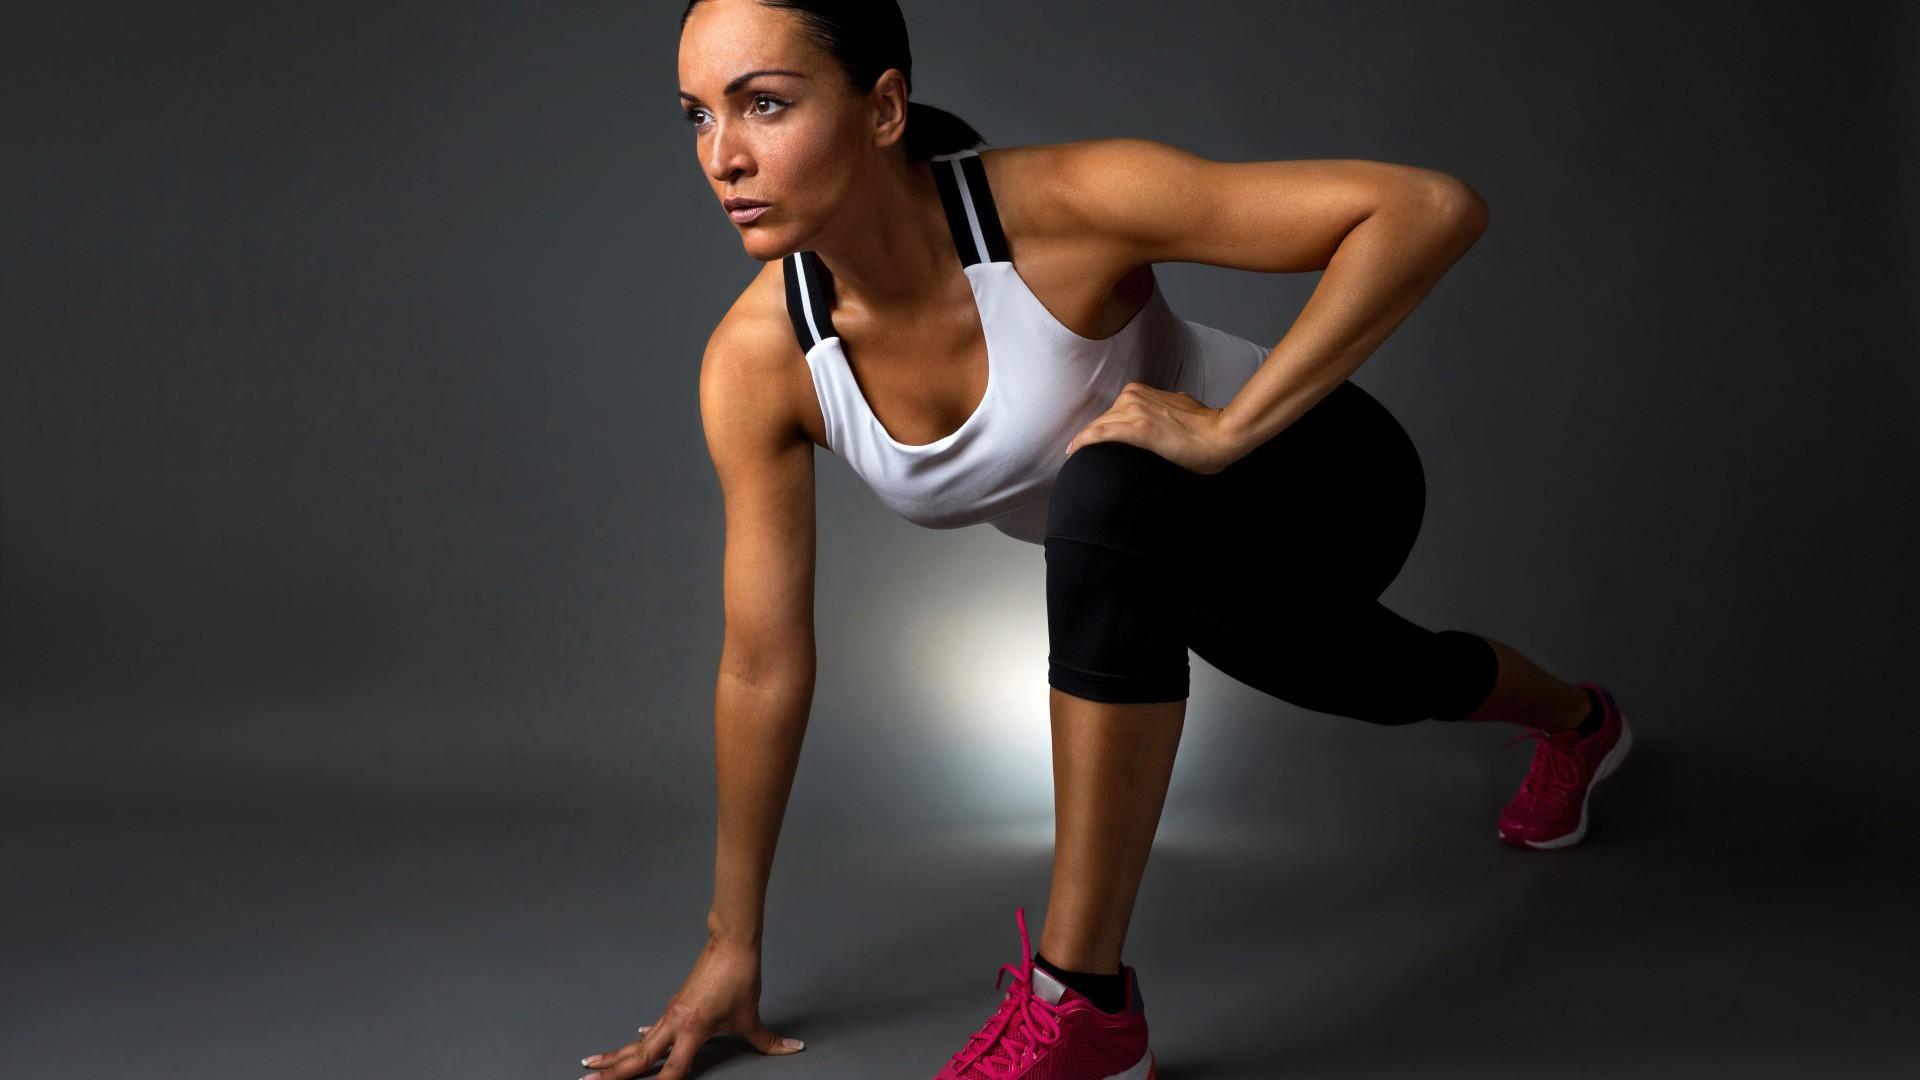 Fitness jpg